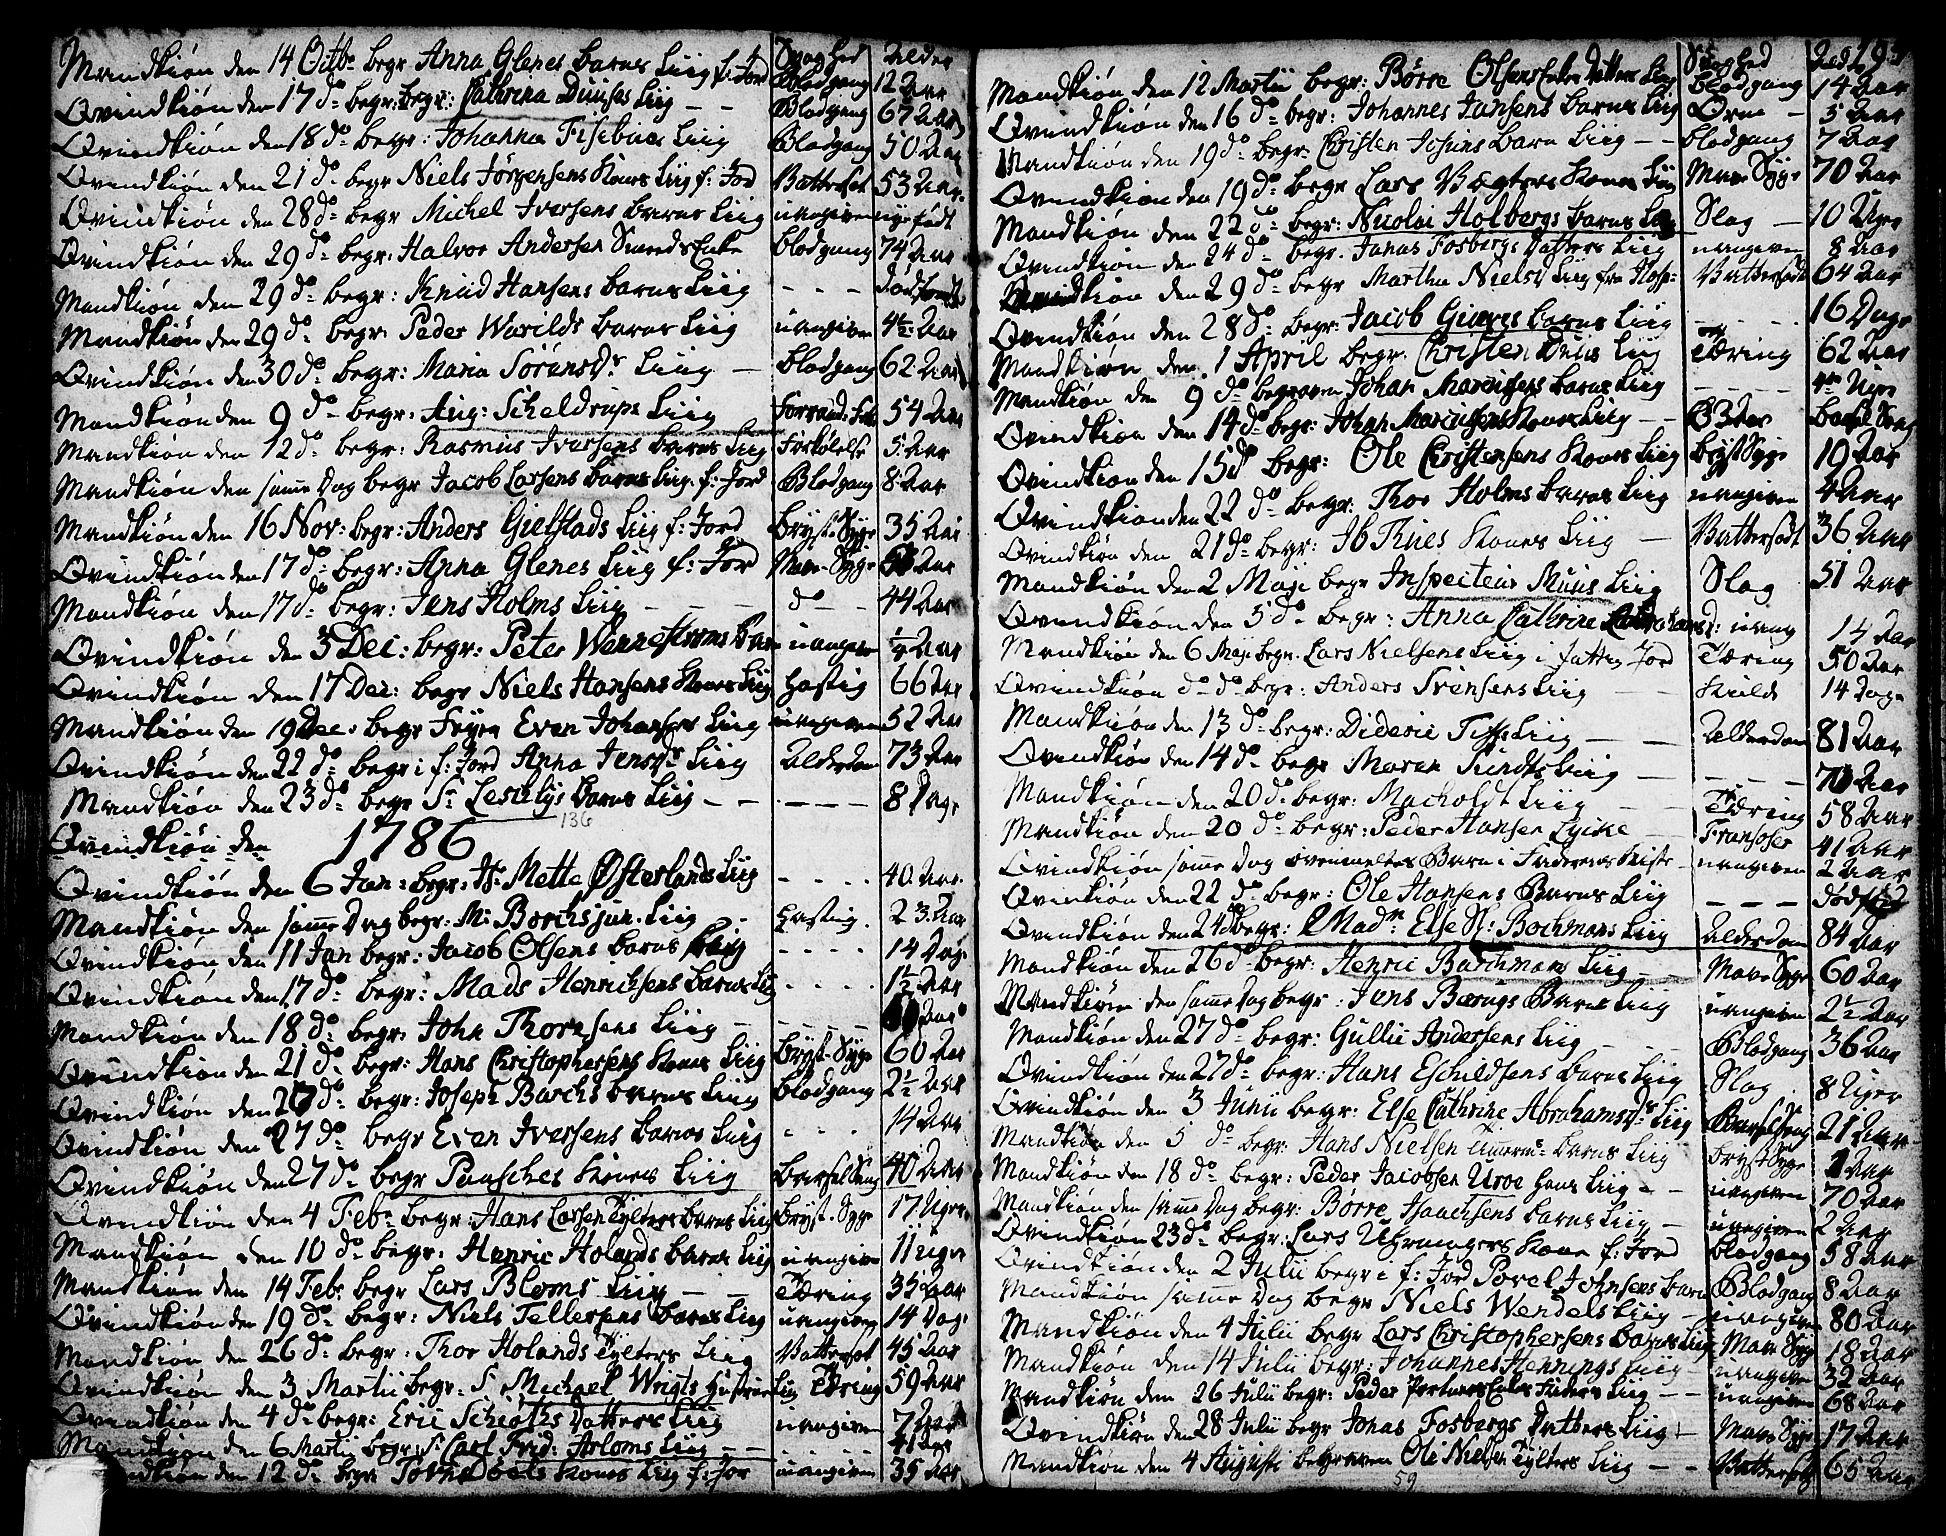 SAKO, Larvik kirkebøker, G/Ga/L0001: Klokkerbok nr. I 1, 1785-1807, s. 194